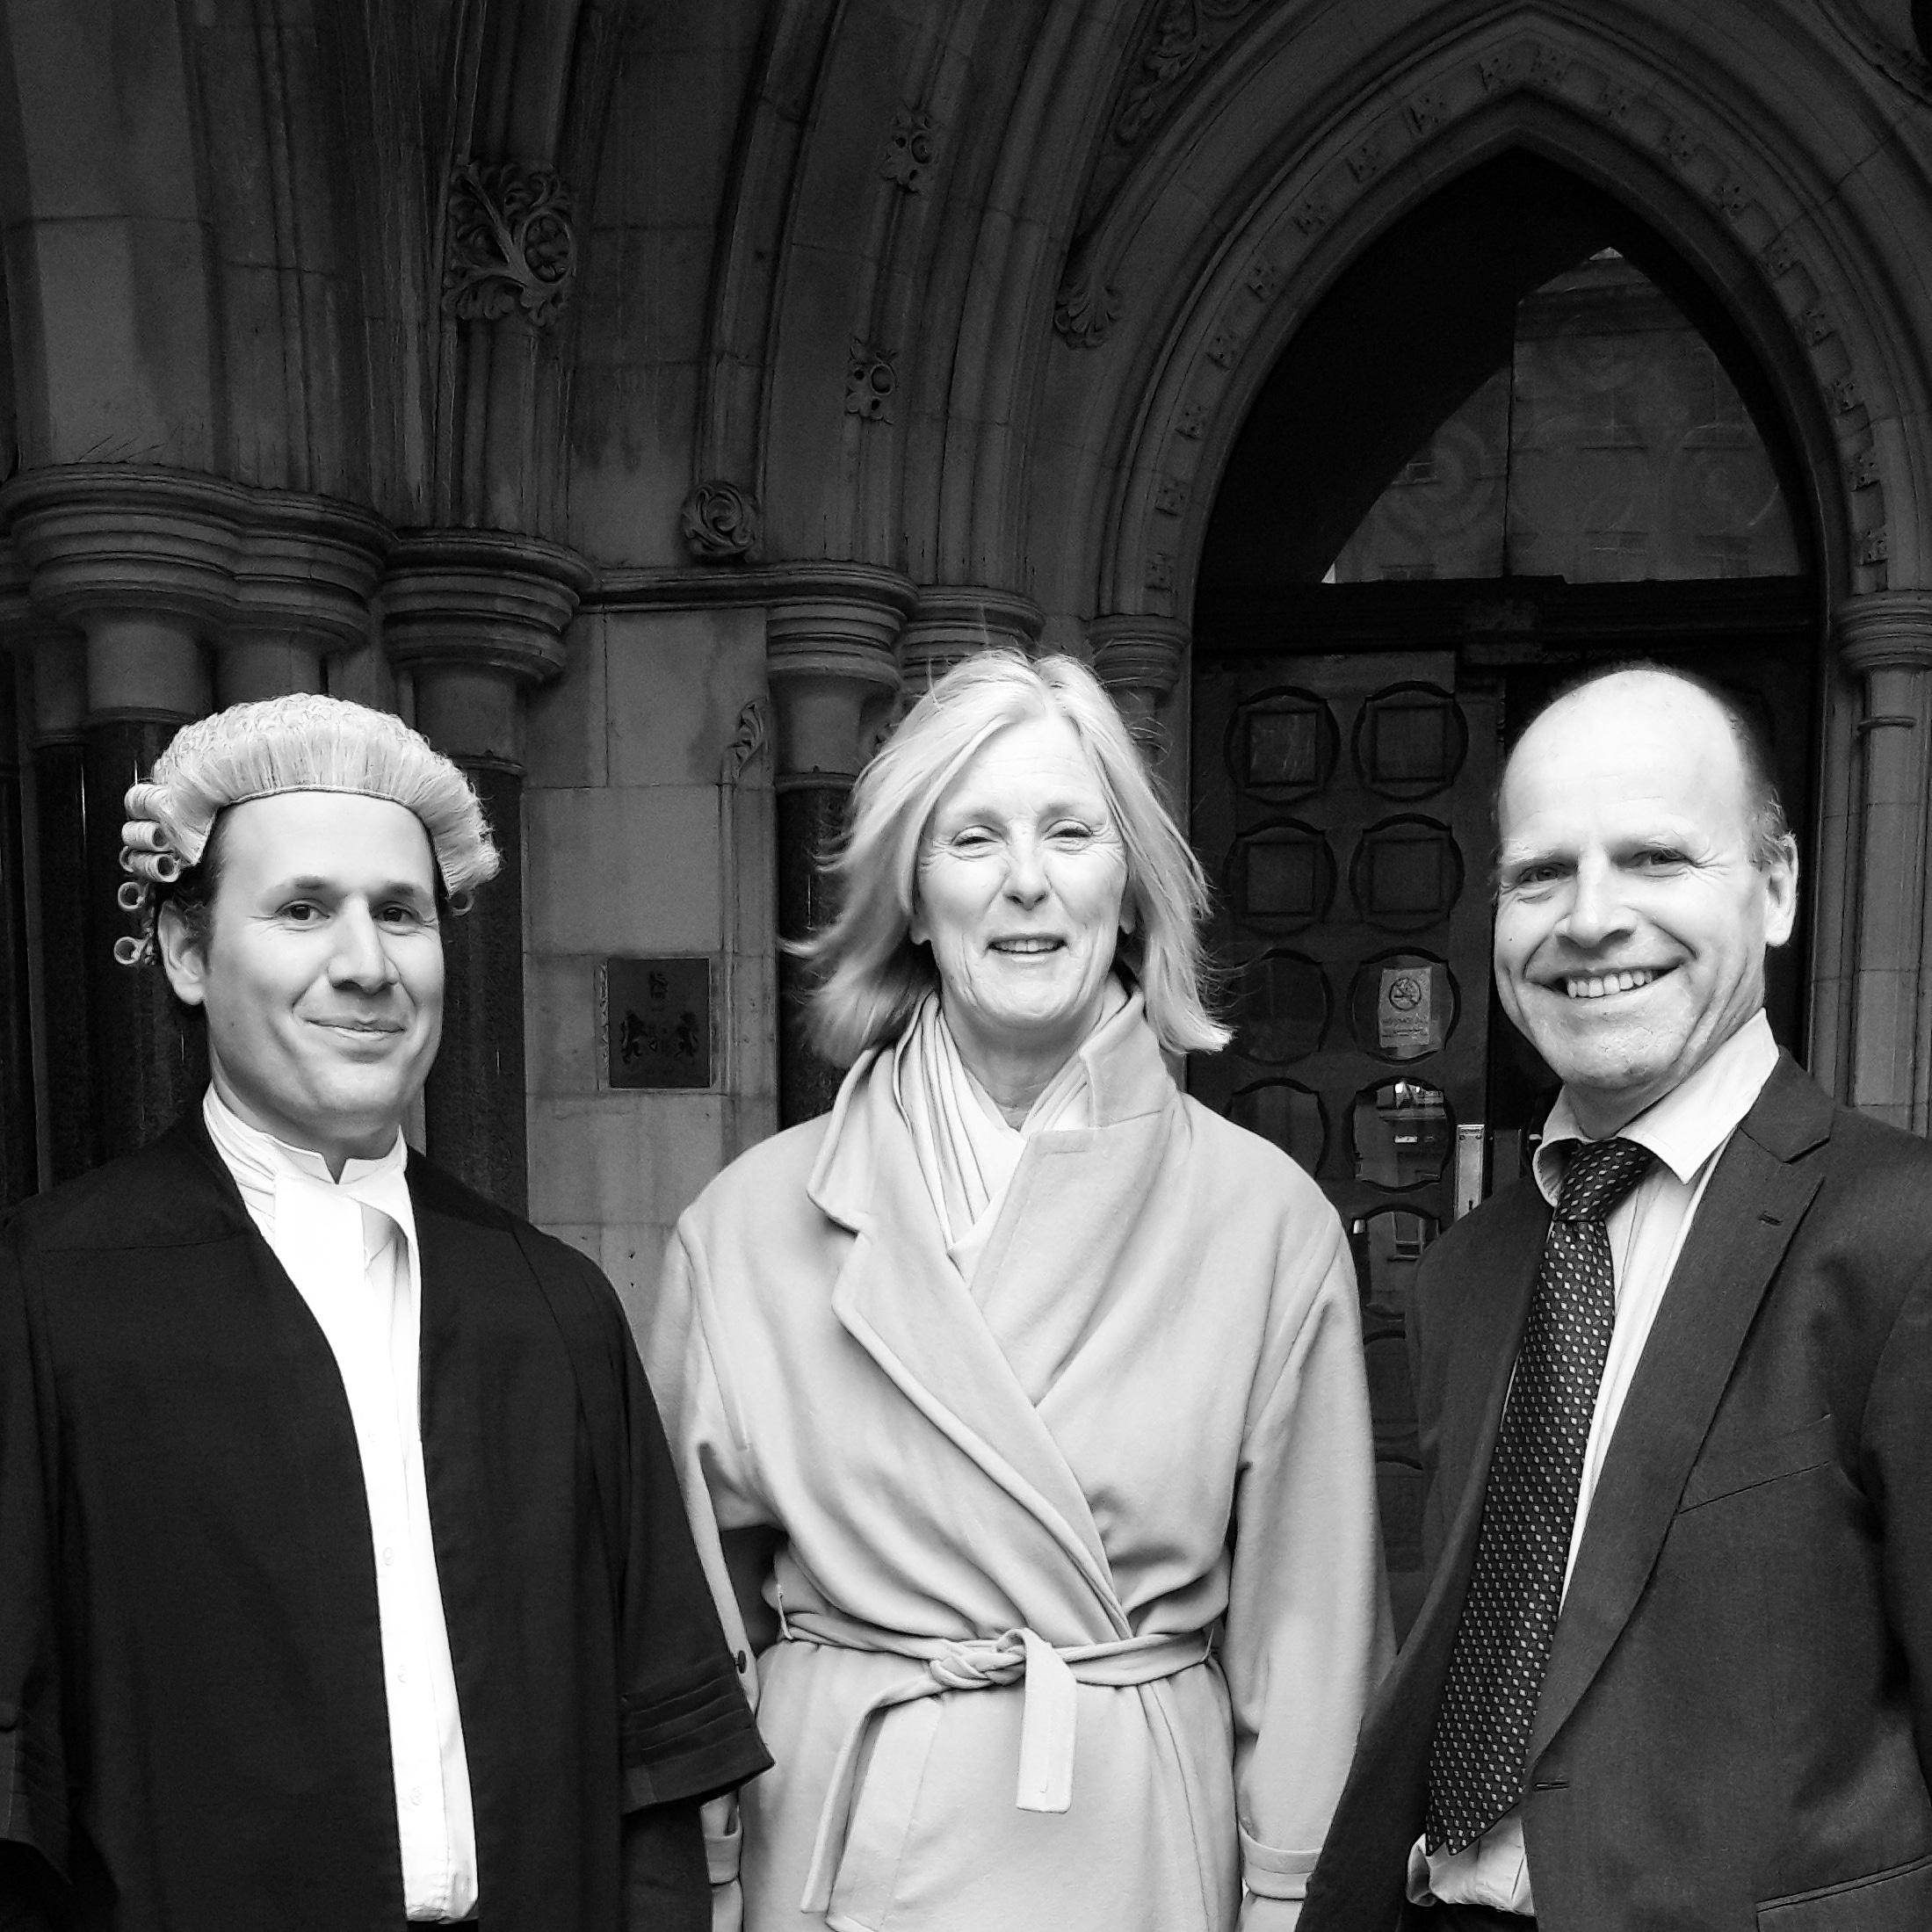 Judicial Review Granted for Dredging Decision